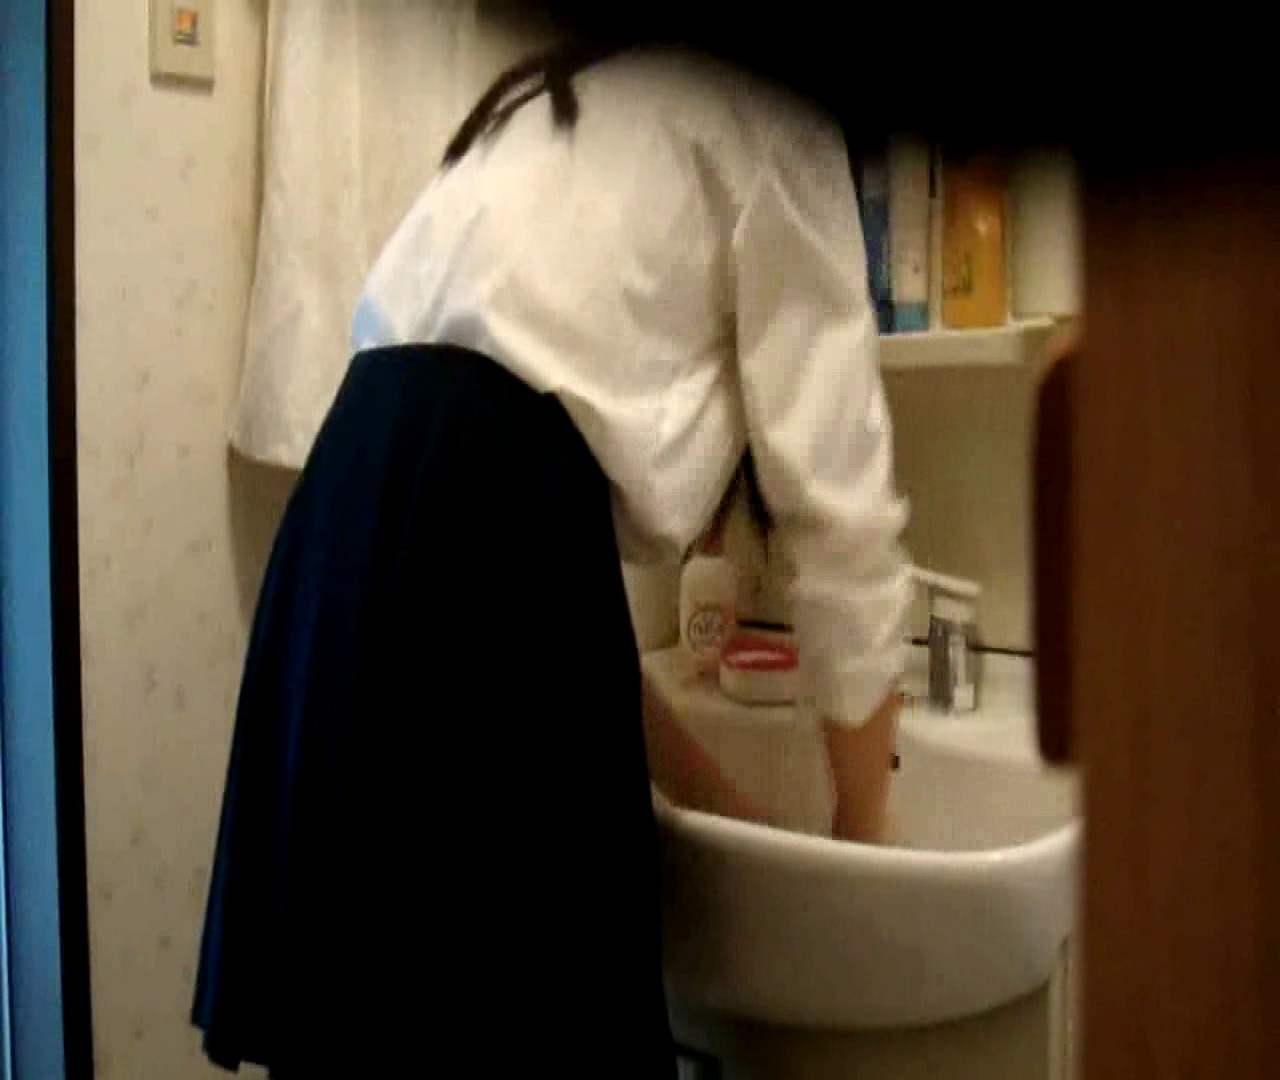 vol.5 まどかが帰宅後の洗顔後にブラを洗ってます。 ギャル達 | 民家  112枚 109